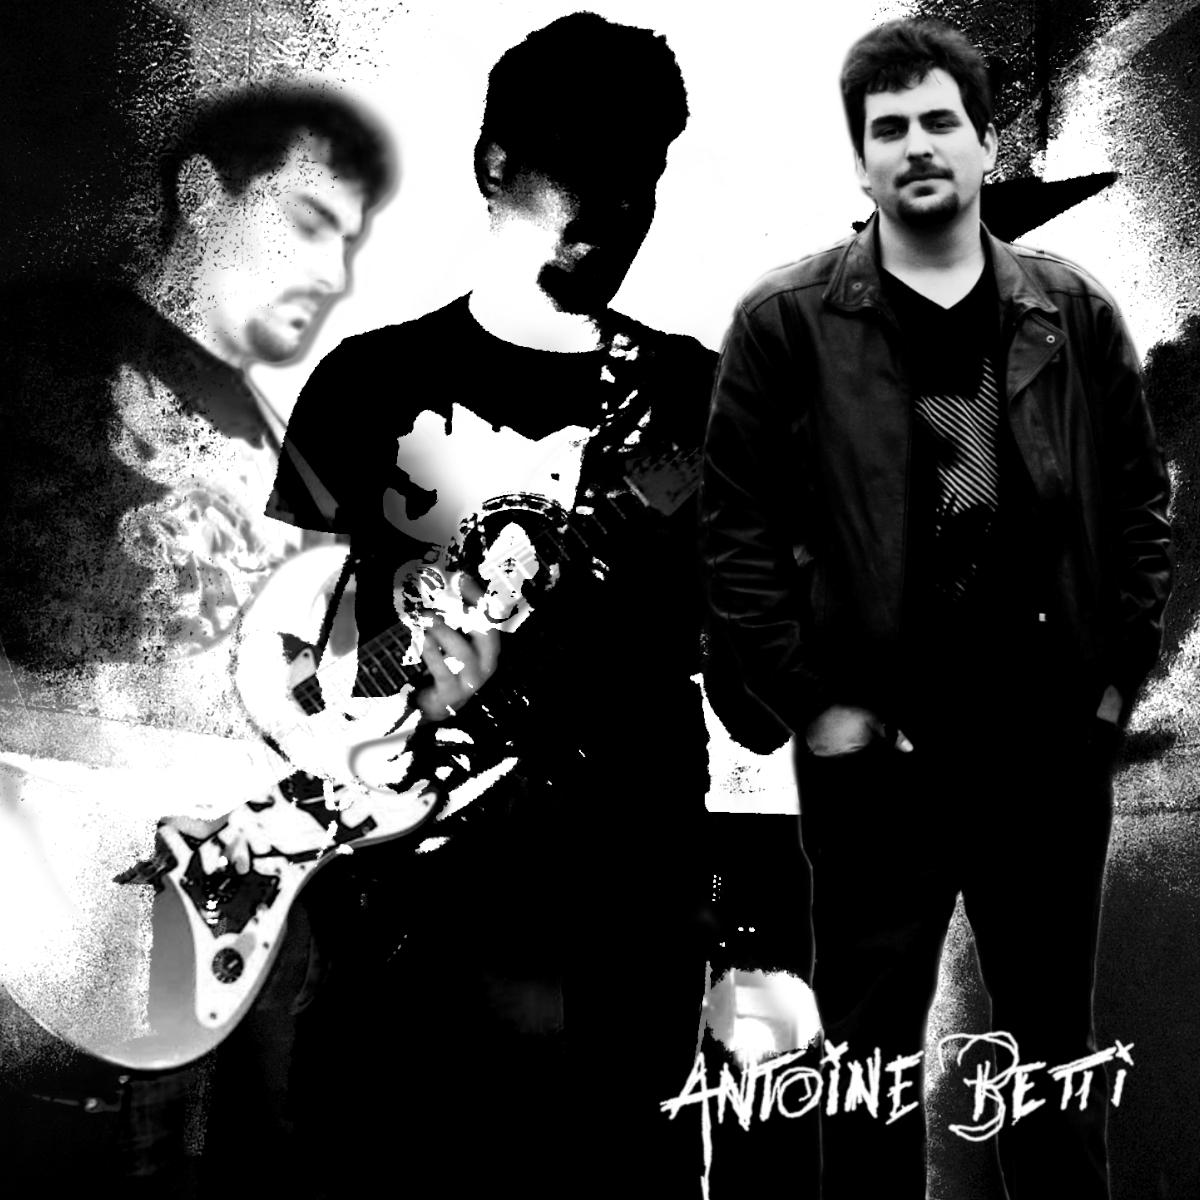 Antoine Betti - Guitar